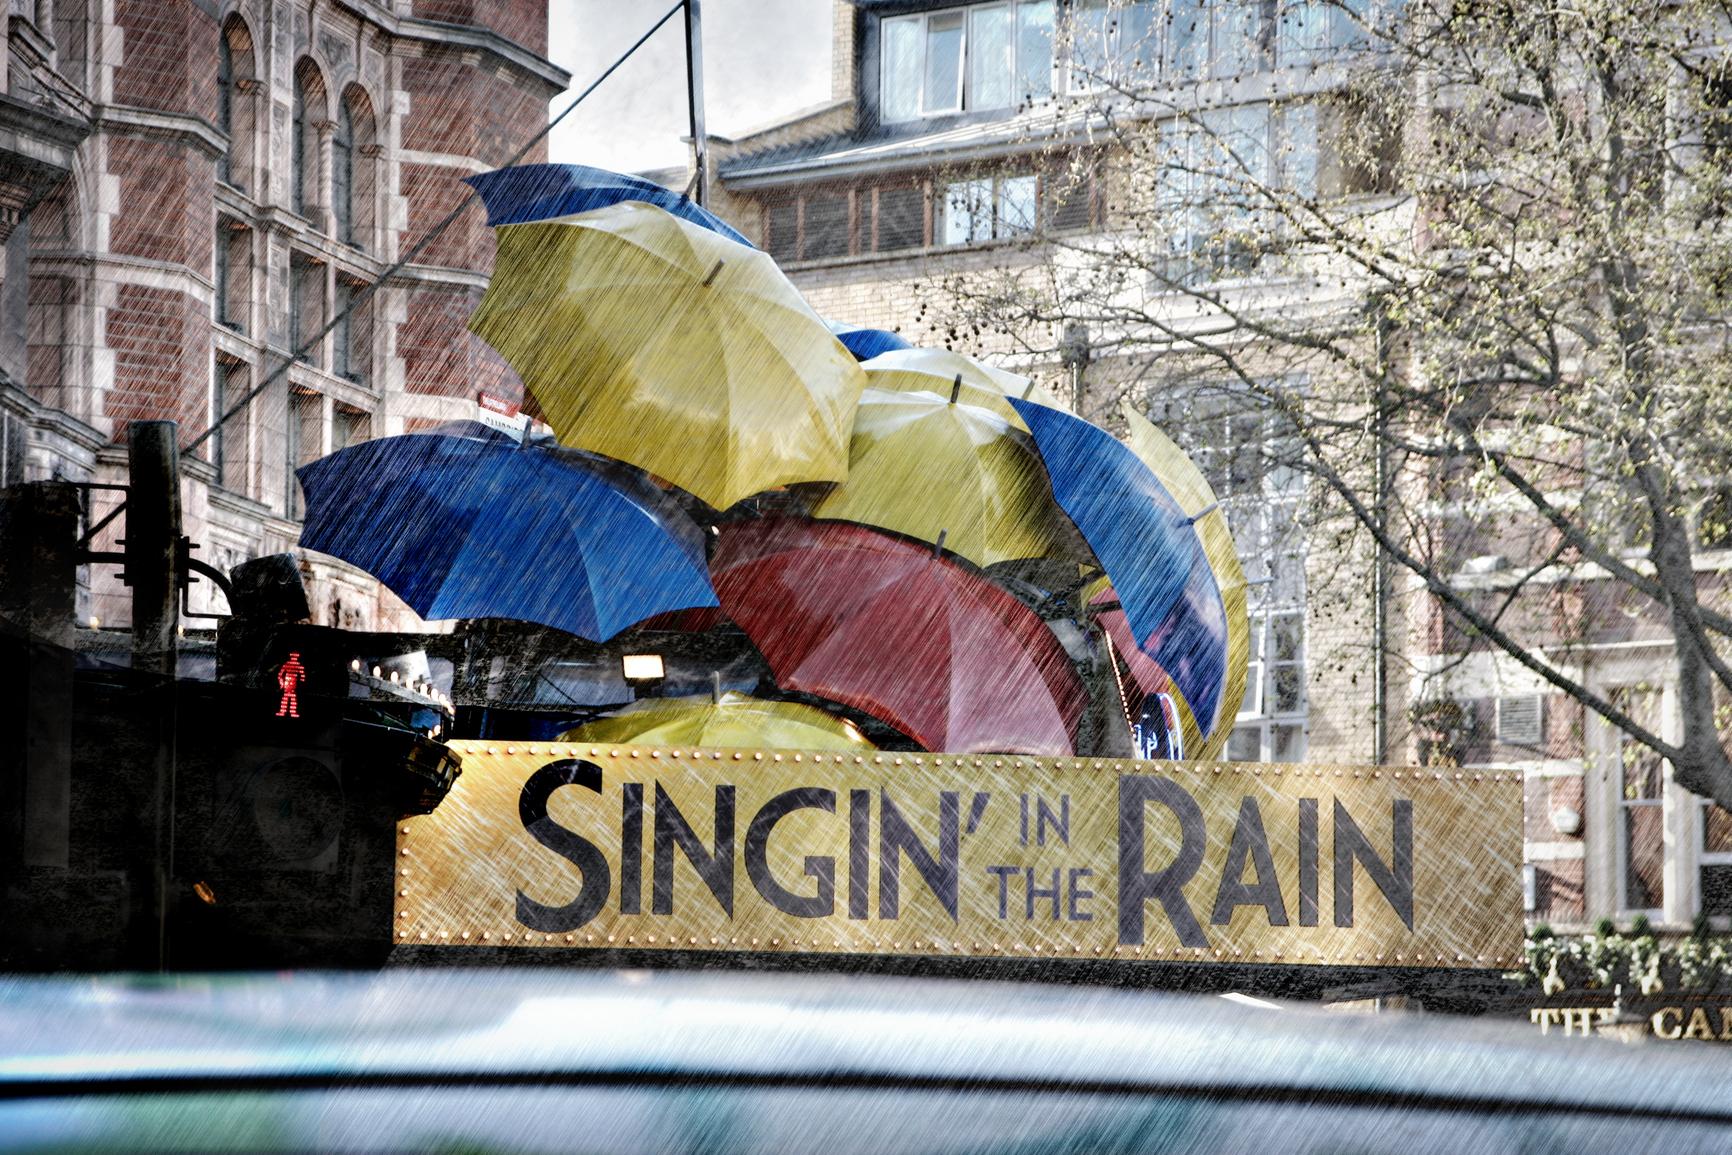 Just Singin' in the Rain di D. Costantini